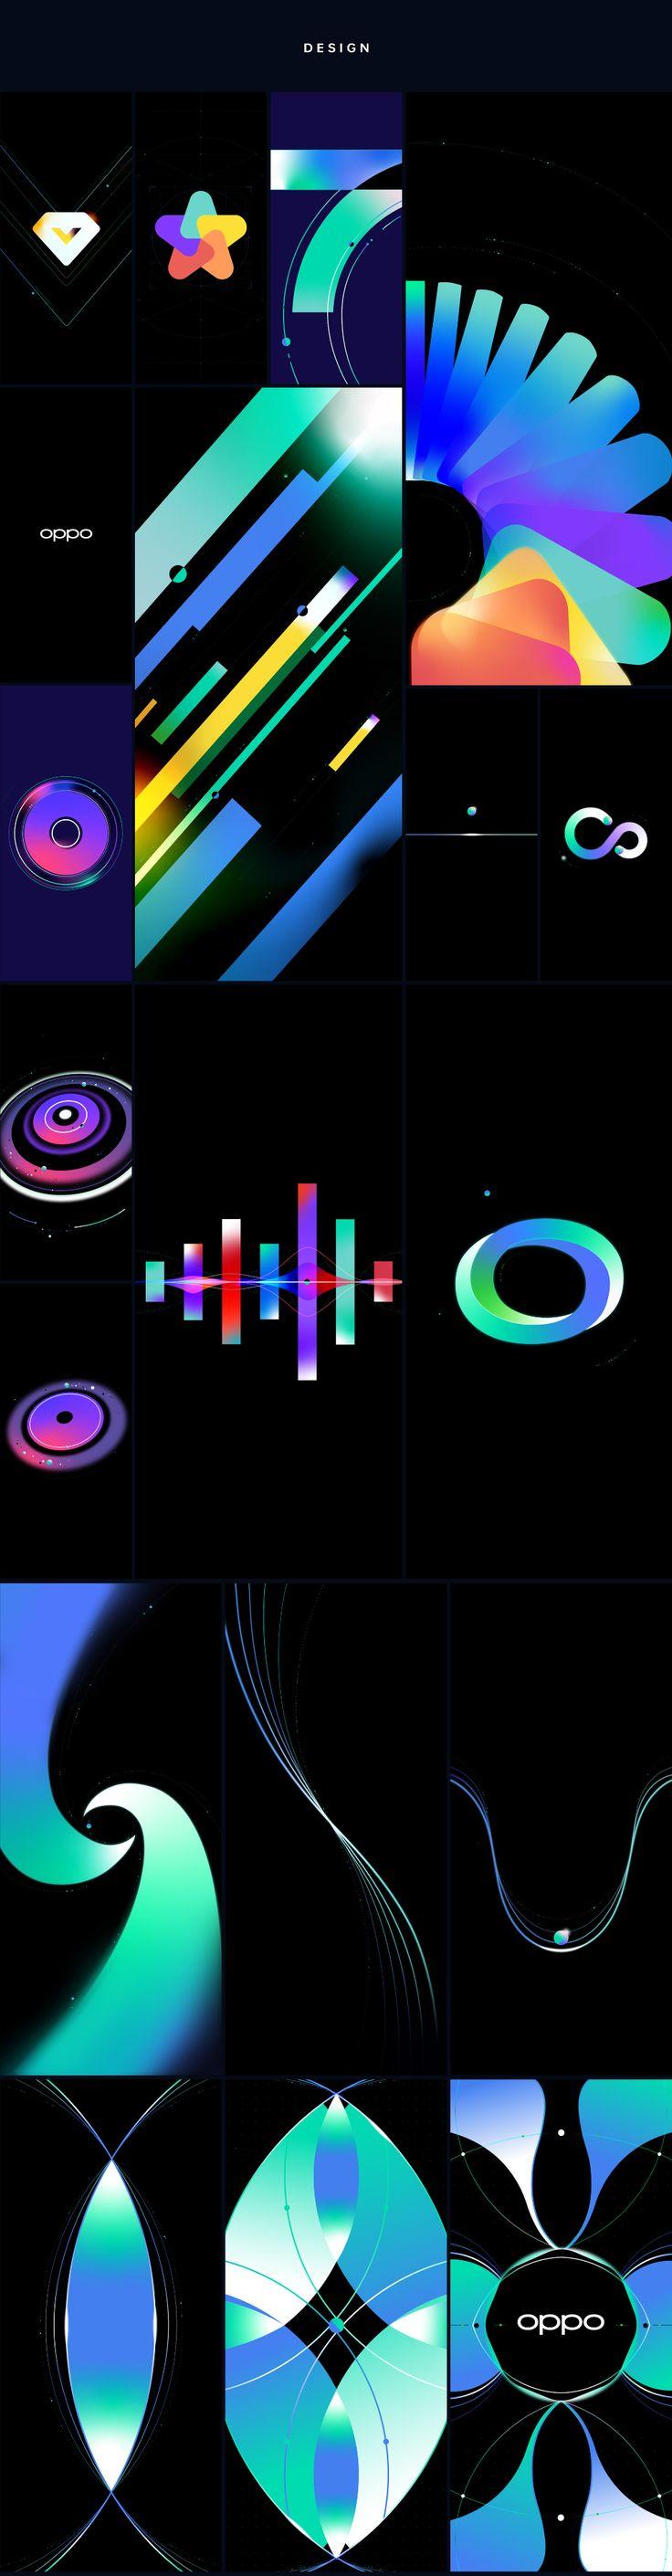 OPPO Reno Screensaver Video on Behance in 2020 Screen